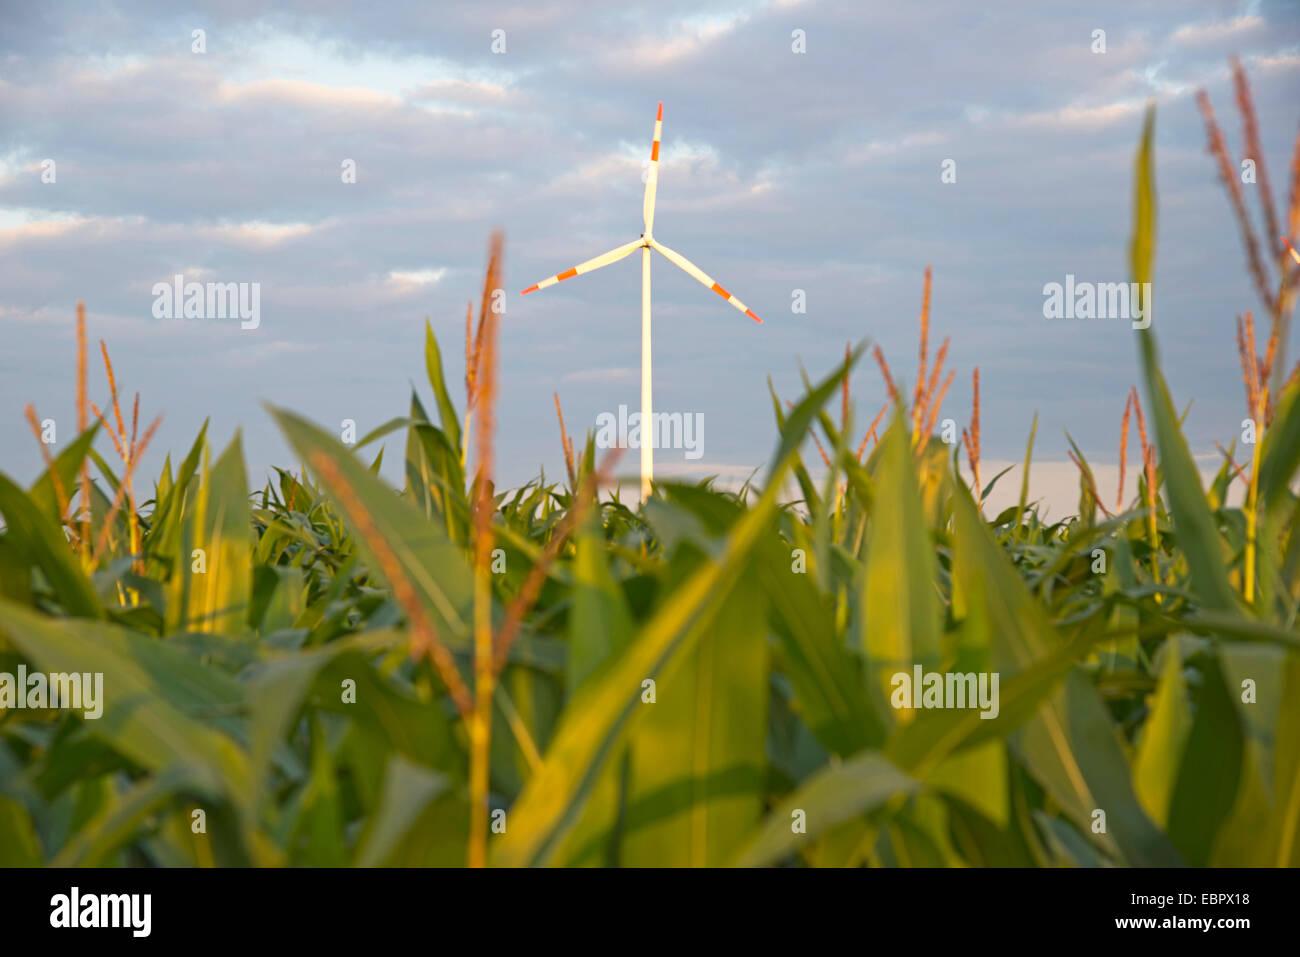 wind wheel and mayze biomass production, Germany, Baden-Wuerttemberg, Swabian Alb, Tomerdingen - Stock Image